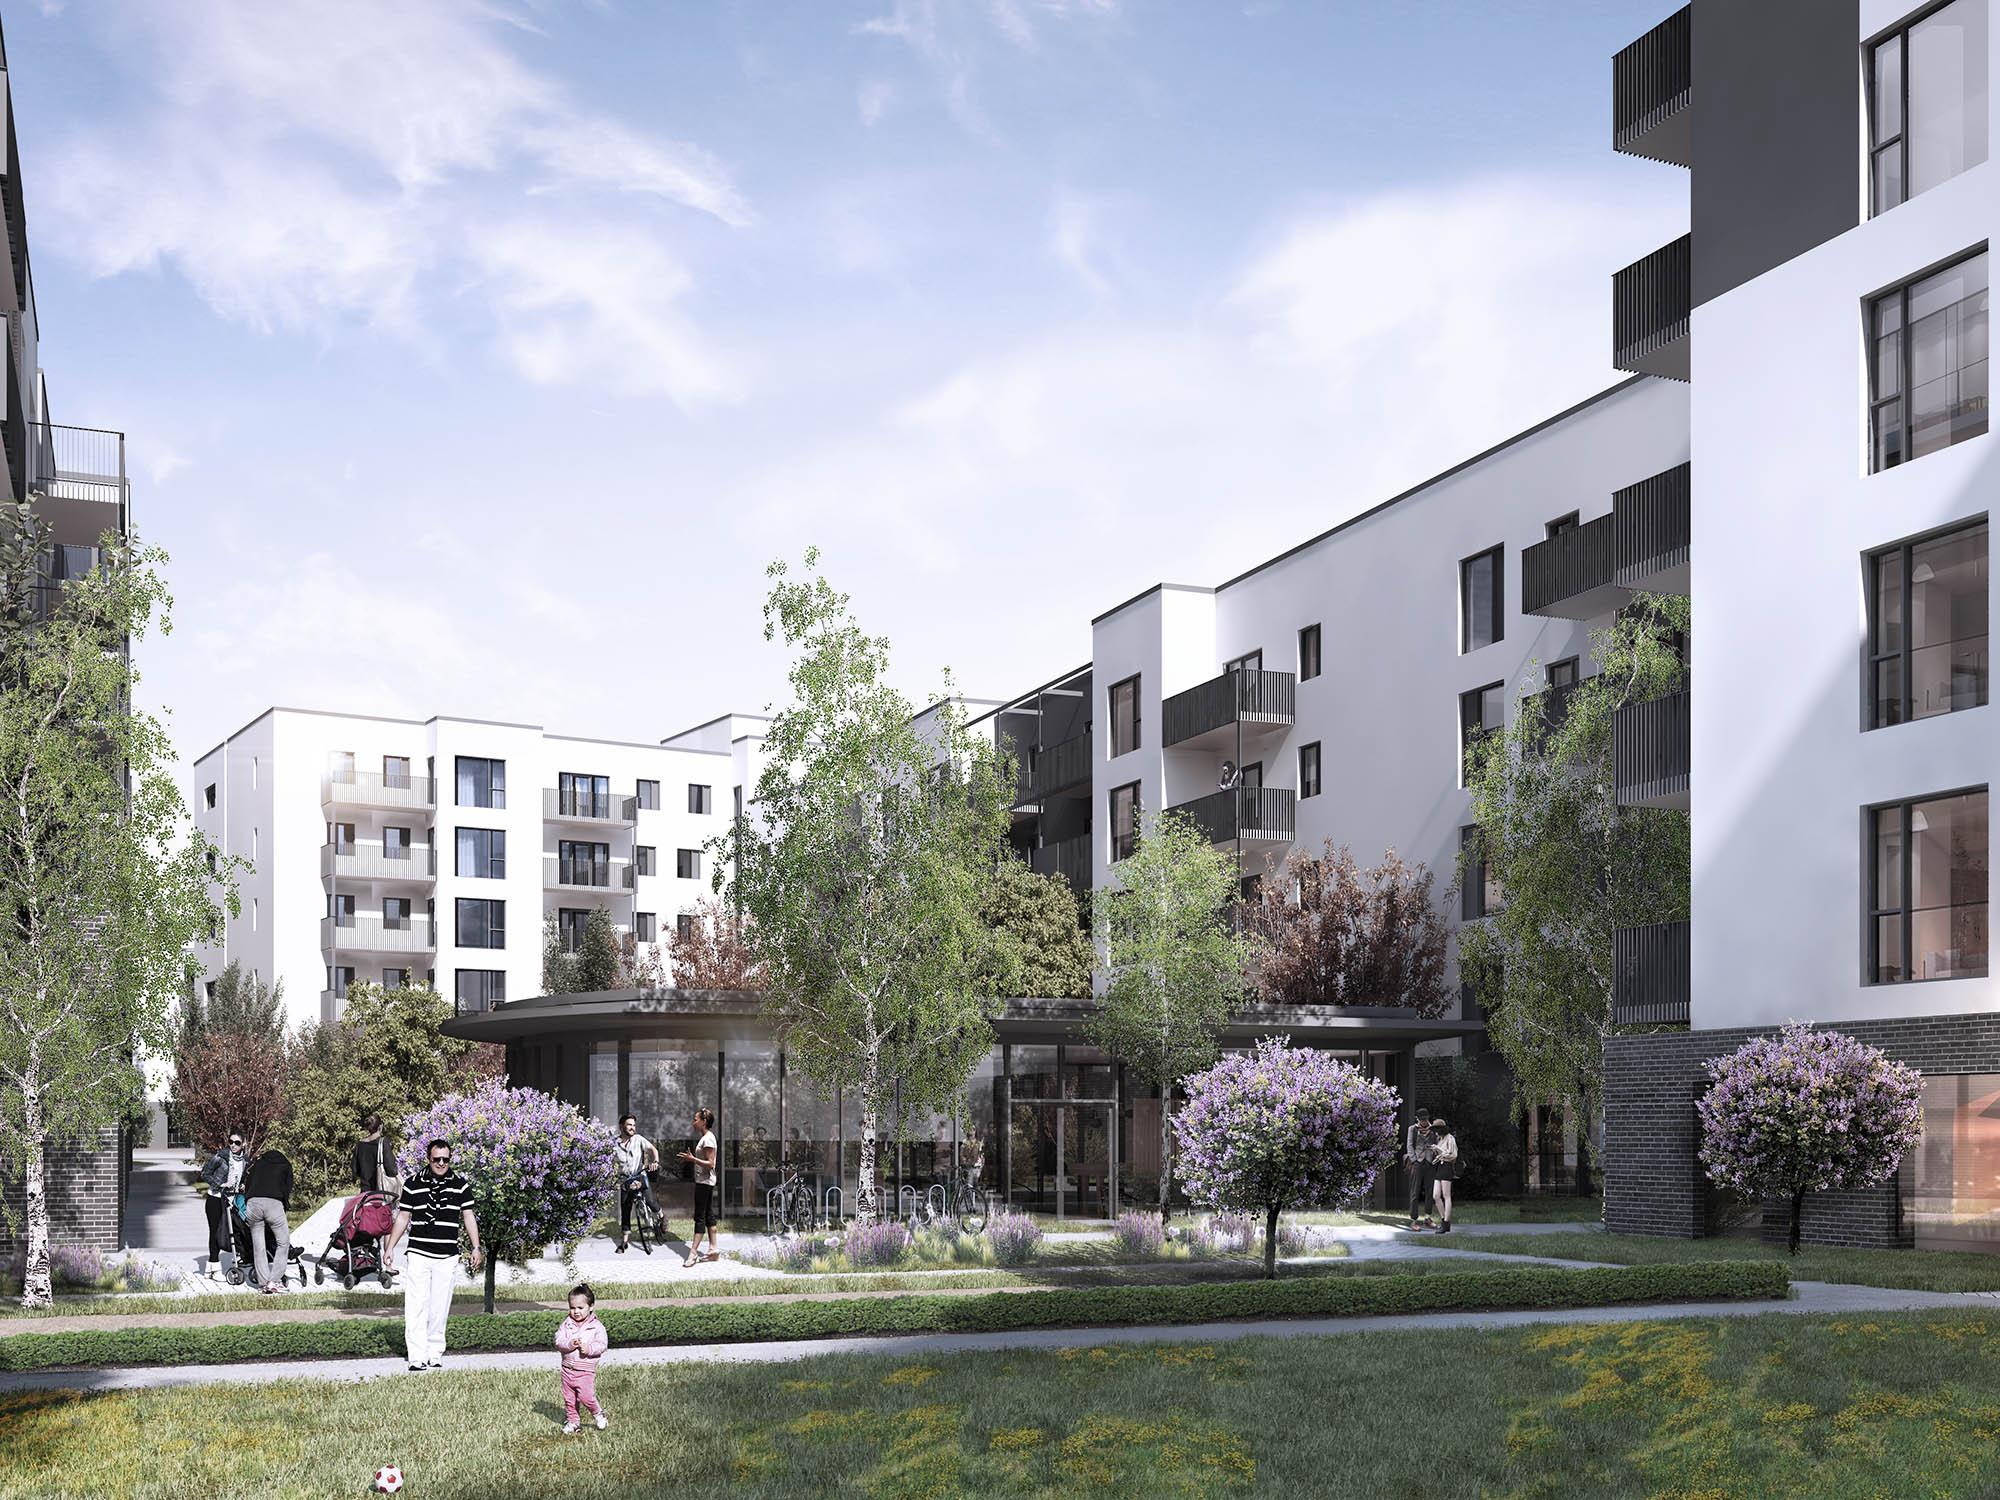 Knocknacarra Galway Strategic Housing Development